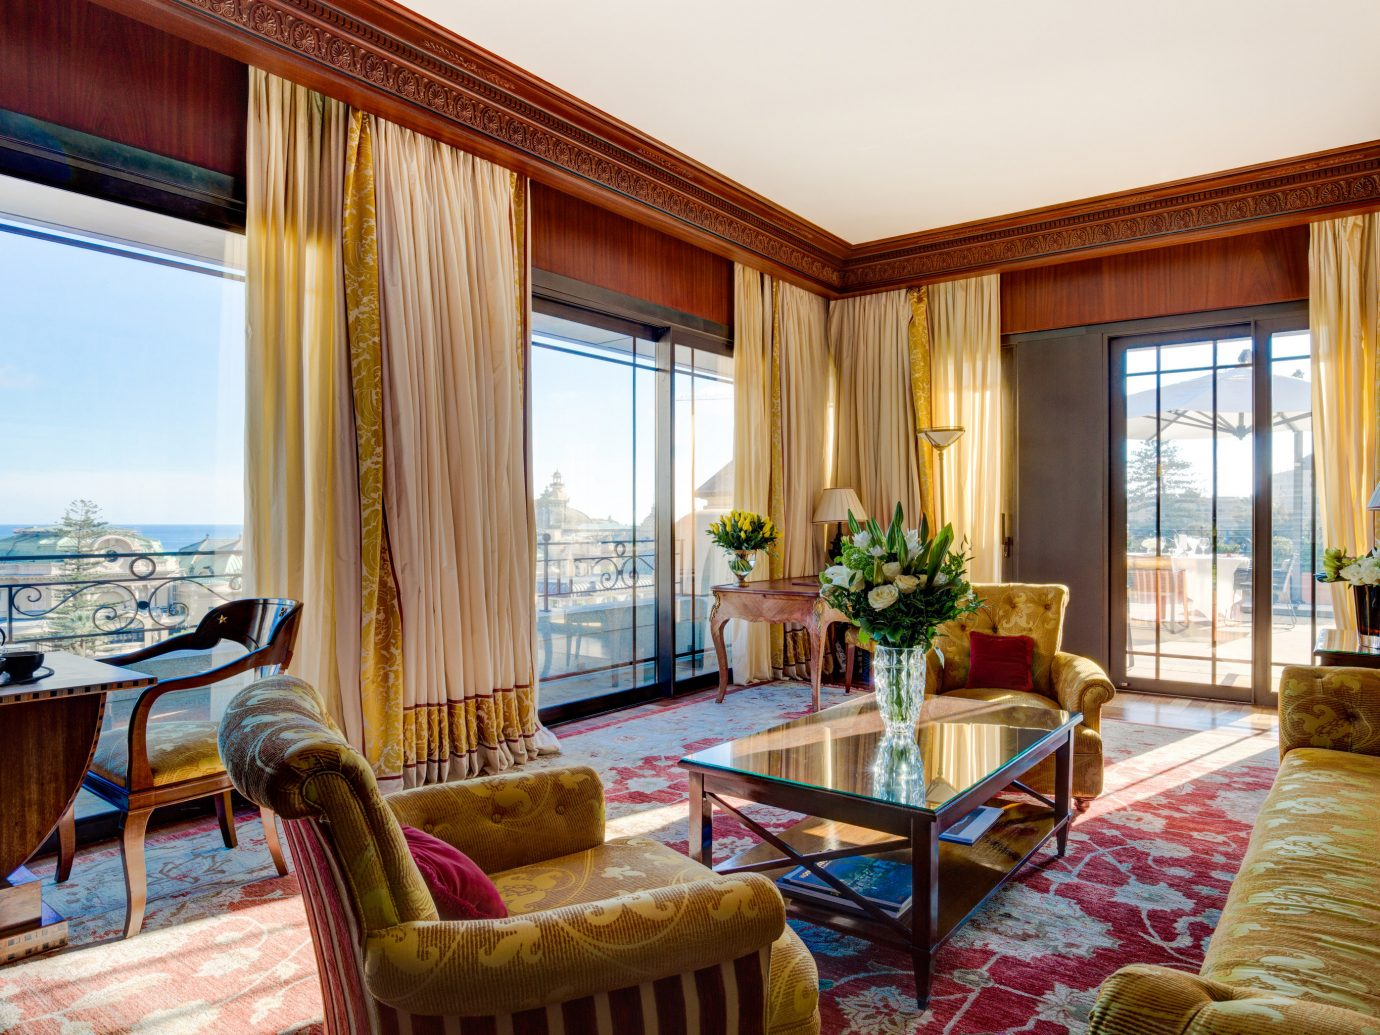 Hotels Romance indoor window room floor Living interior design Suite real estate estate living room furniture Bedroom